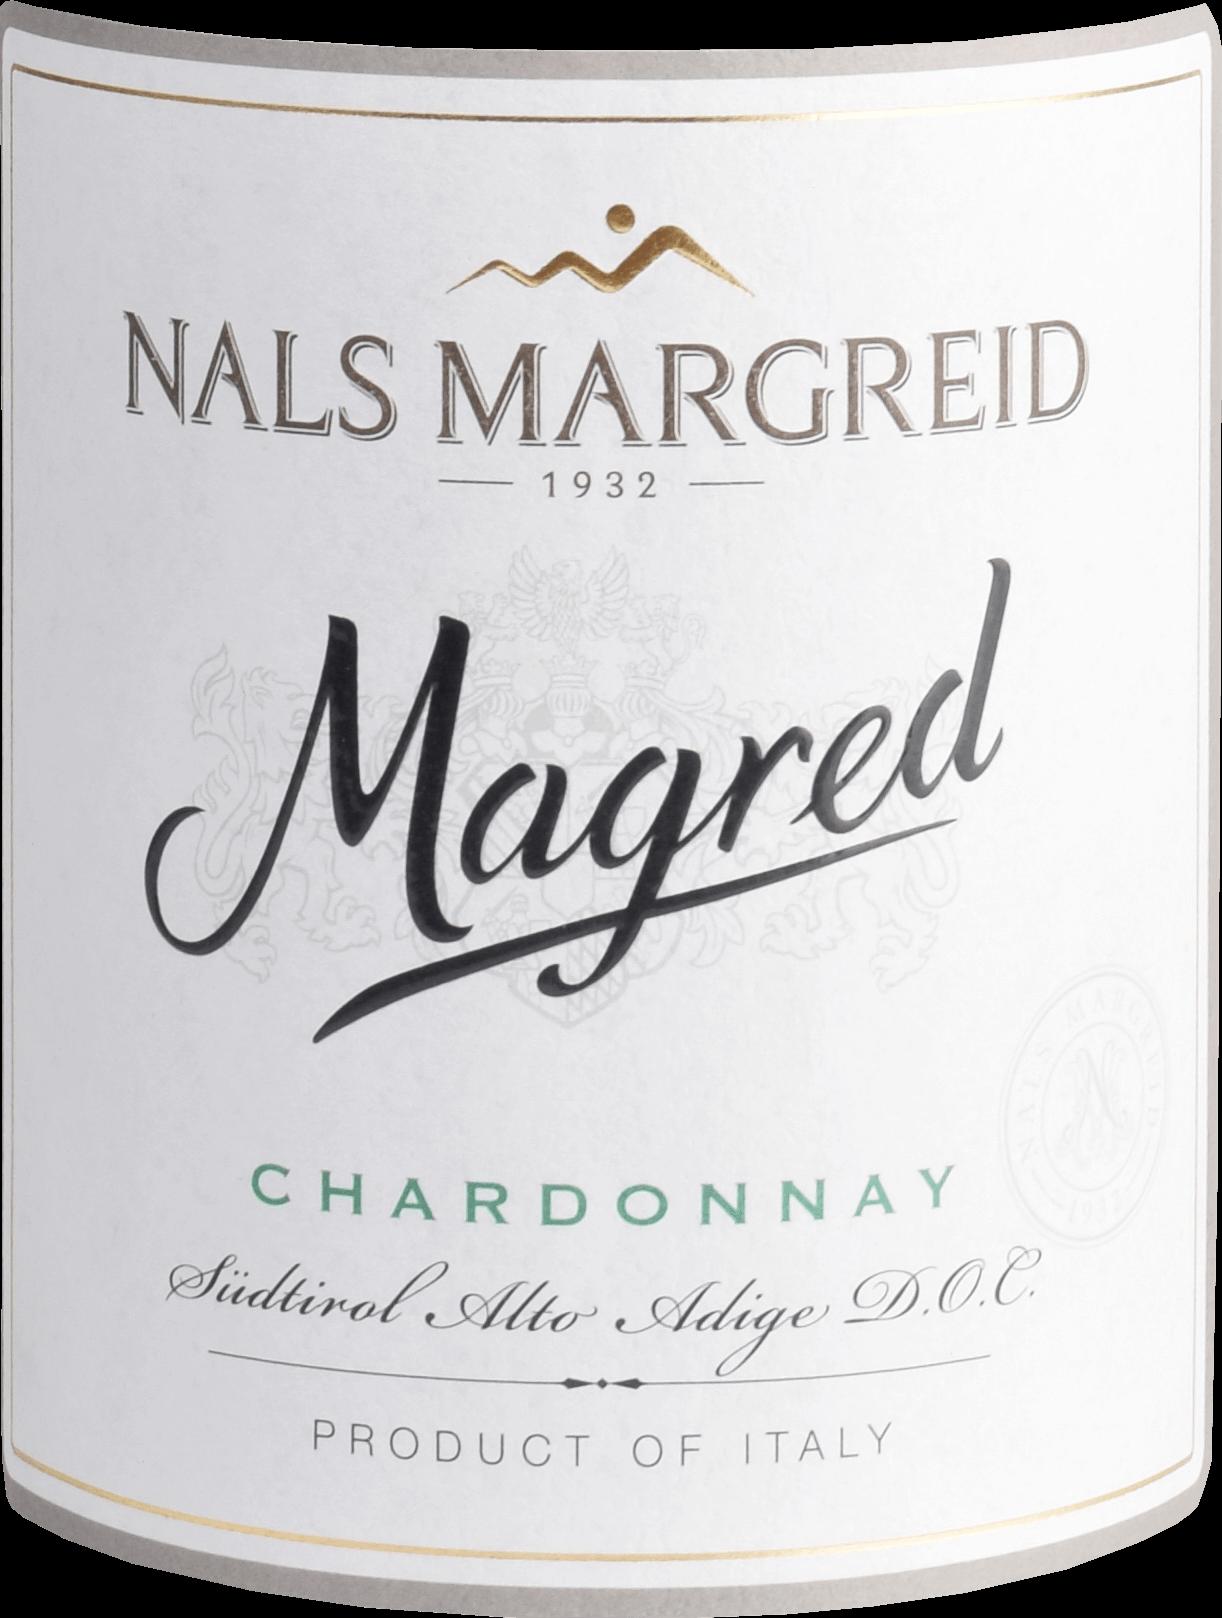 Magred Chardonny Alto Adige DOC - Nals Margreid